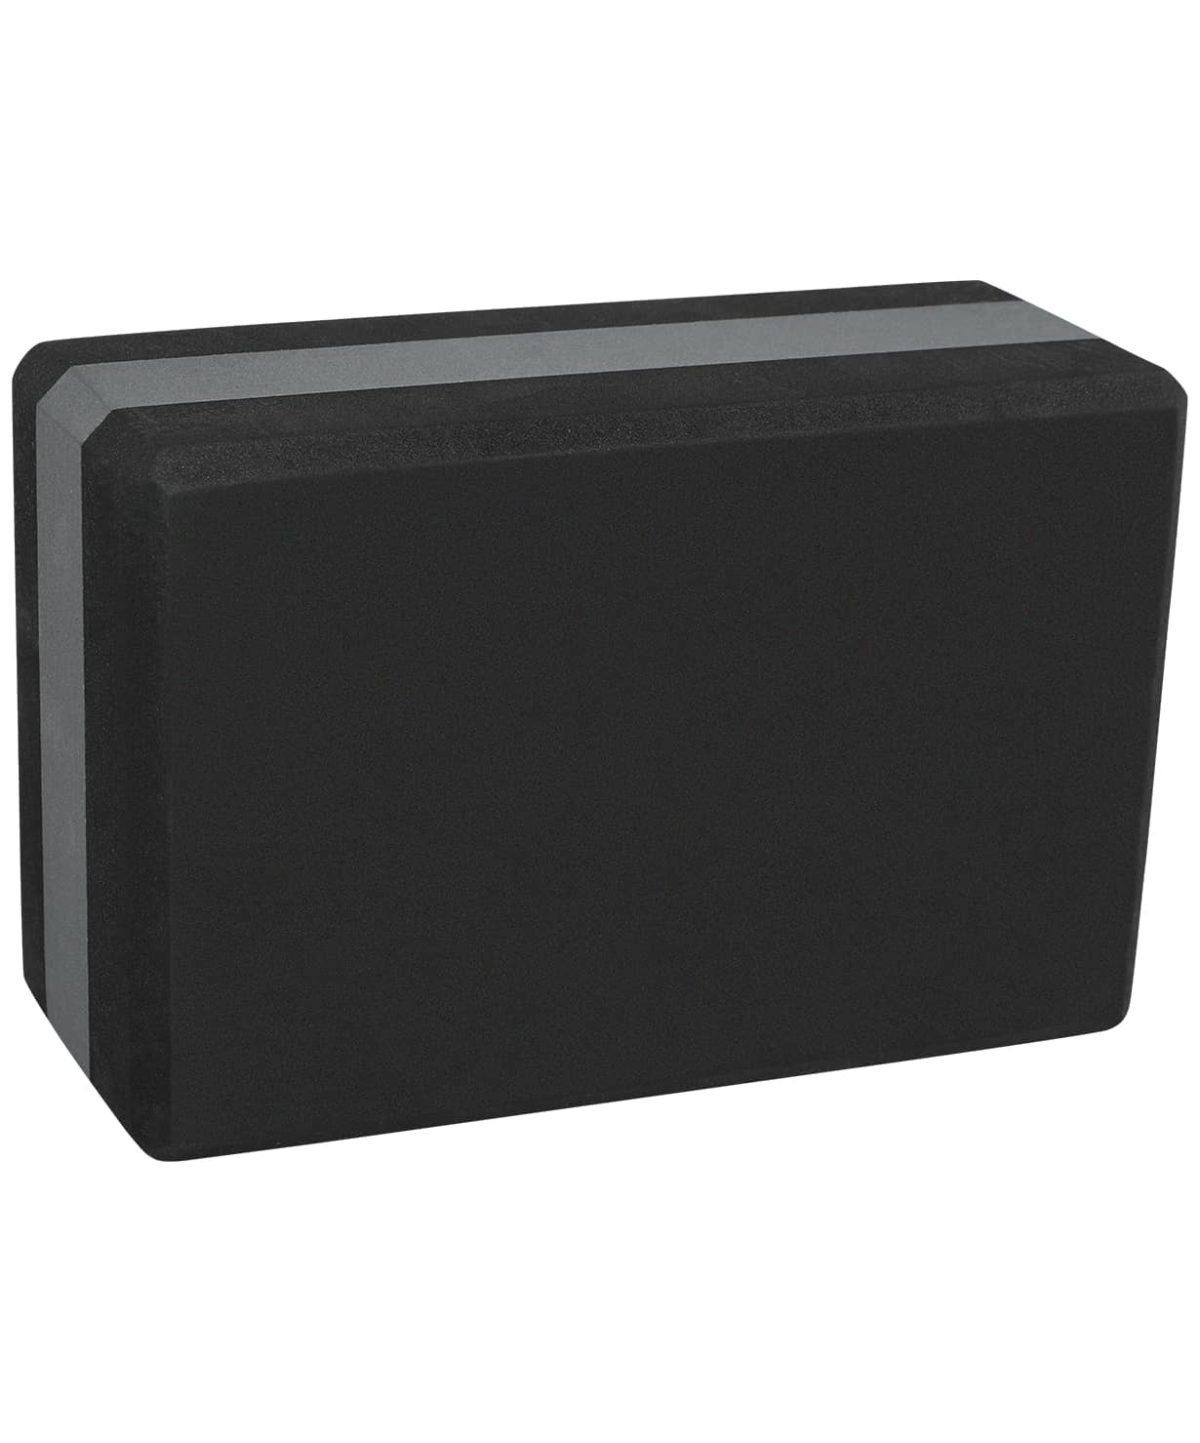 STARFIT EVA Блок для йоги  YB-201: черно-серый - 2